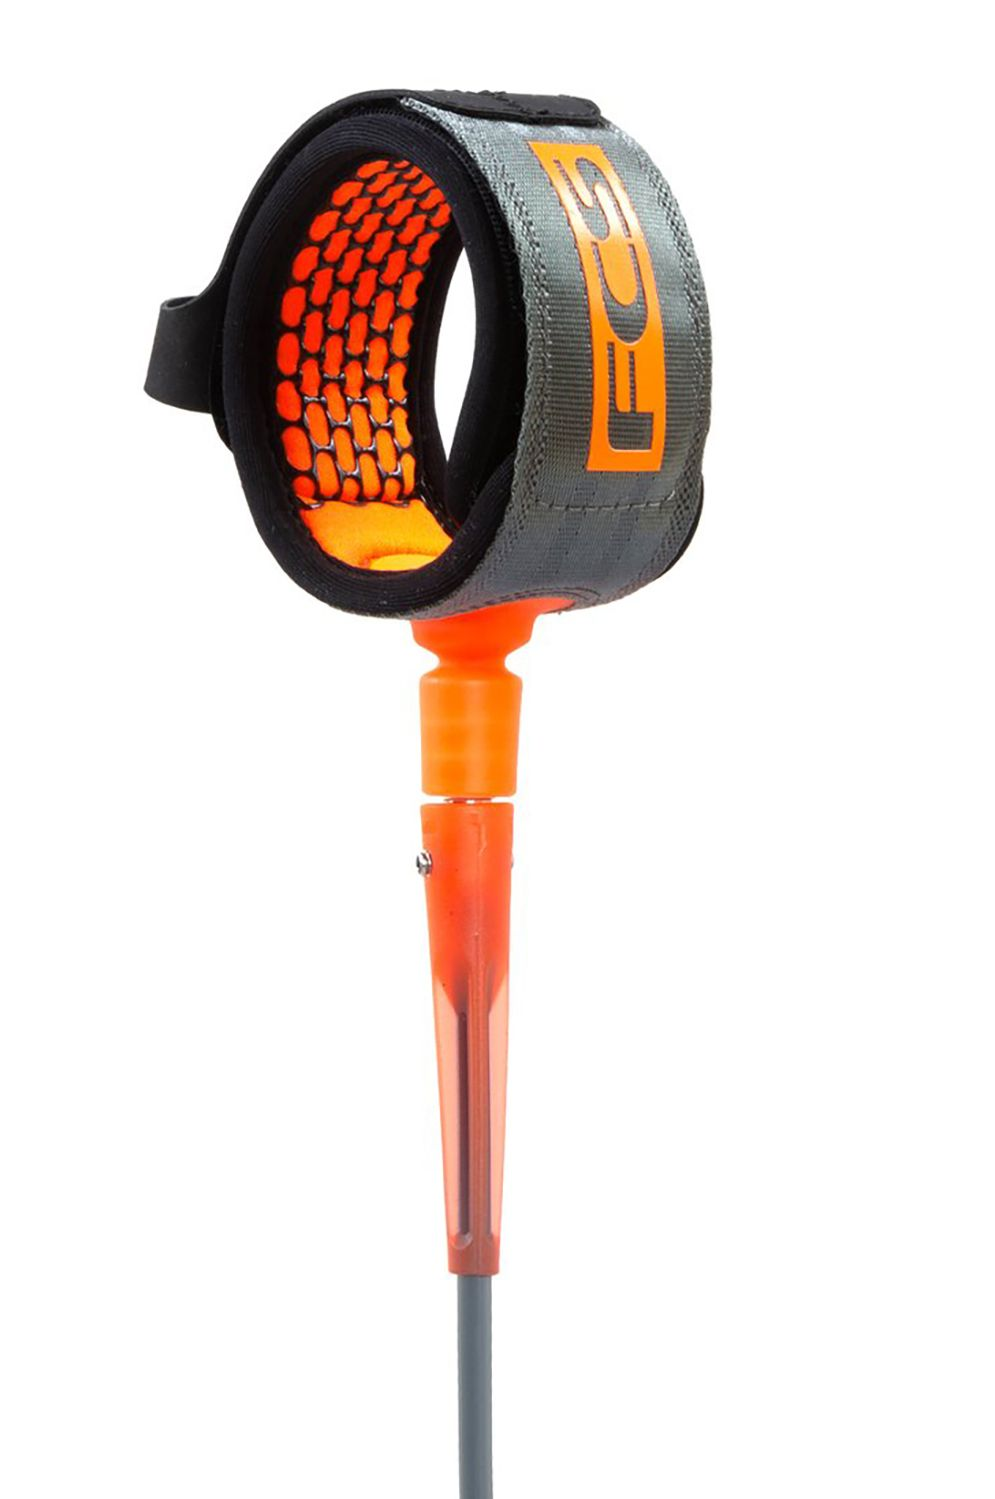 Leash Fcs 8' ALL ROUND ESSENTIAL Charcoal/Blood Orange